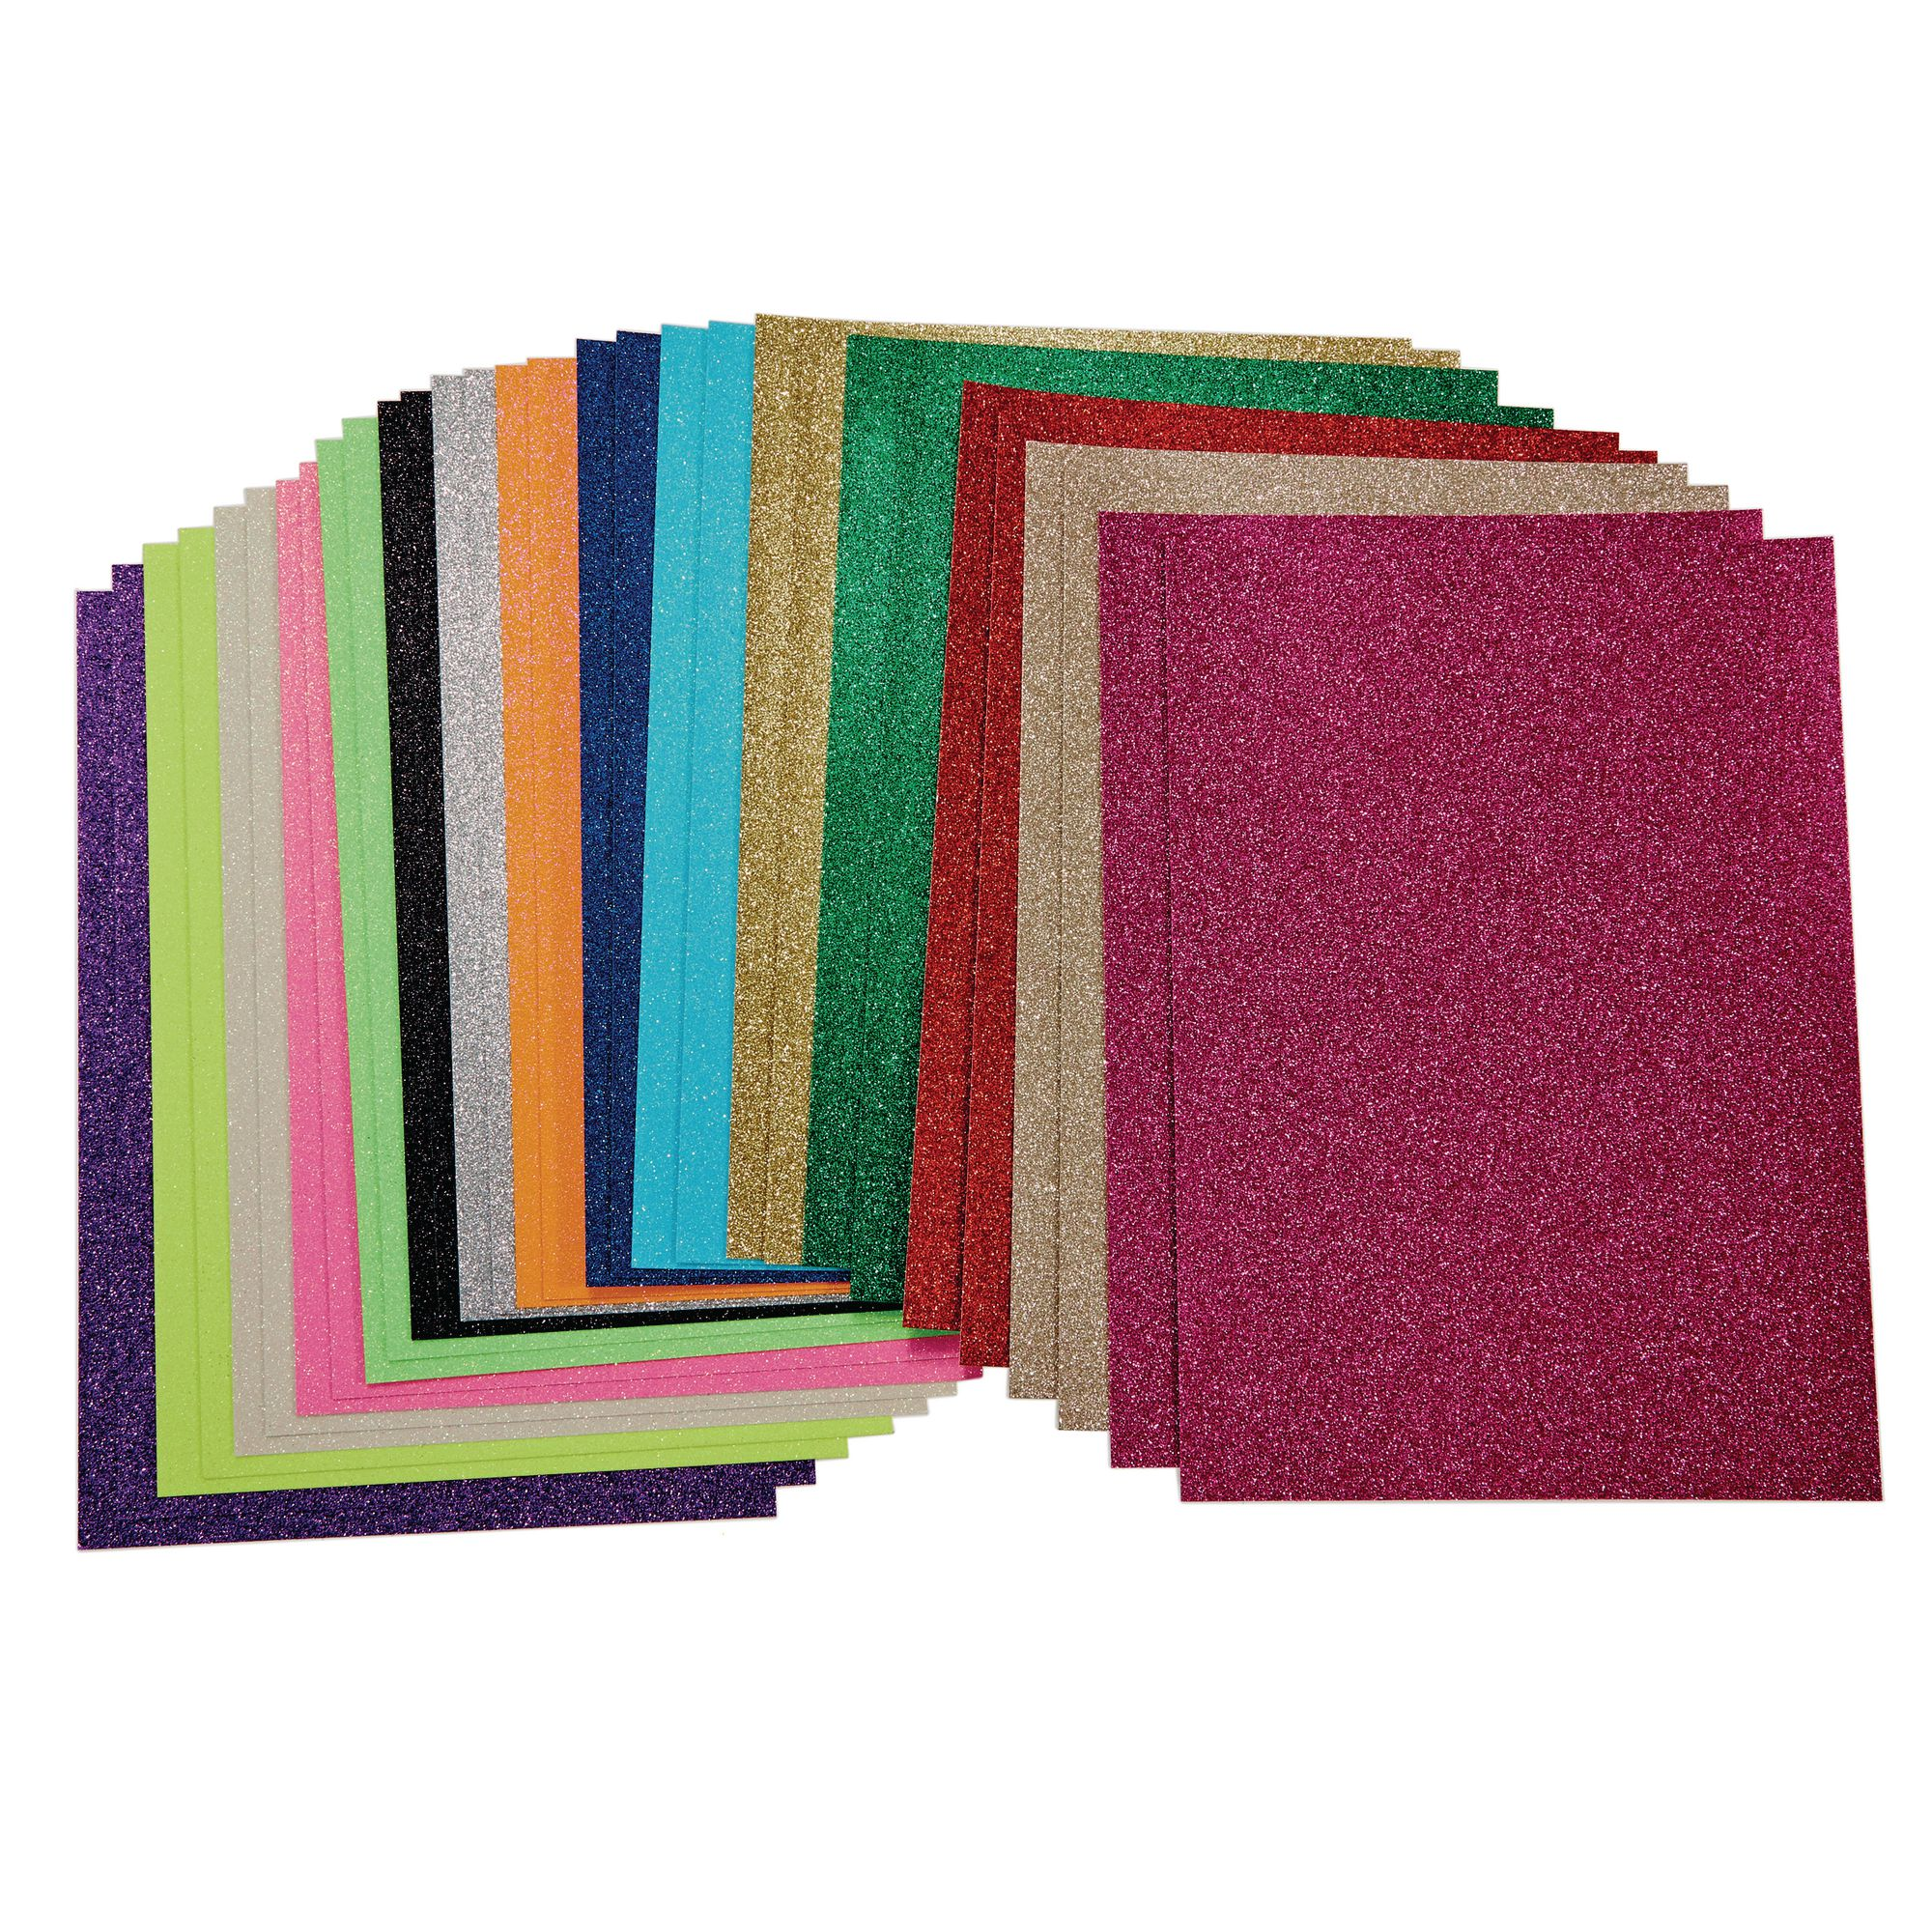 G1560012 Glitter Card A4 Pack Of 30 Gls Educational Supplies